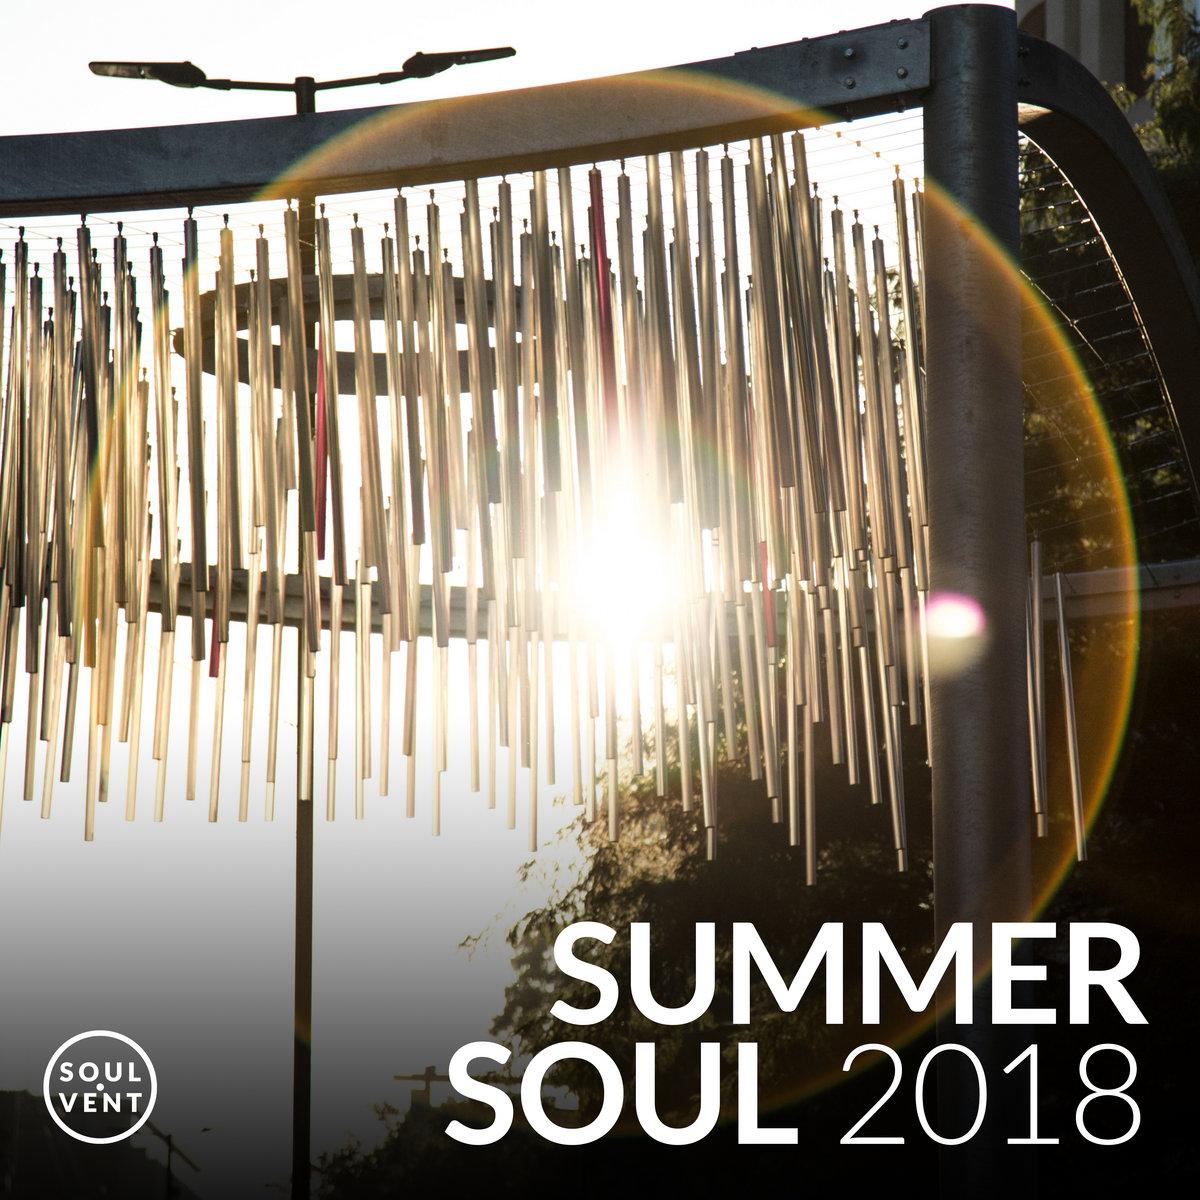 Summer Soul VA EP 2018 (SV045)   Soulvent Records